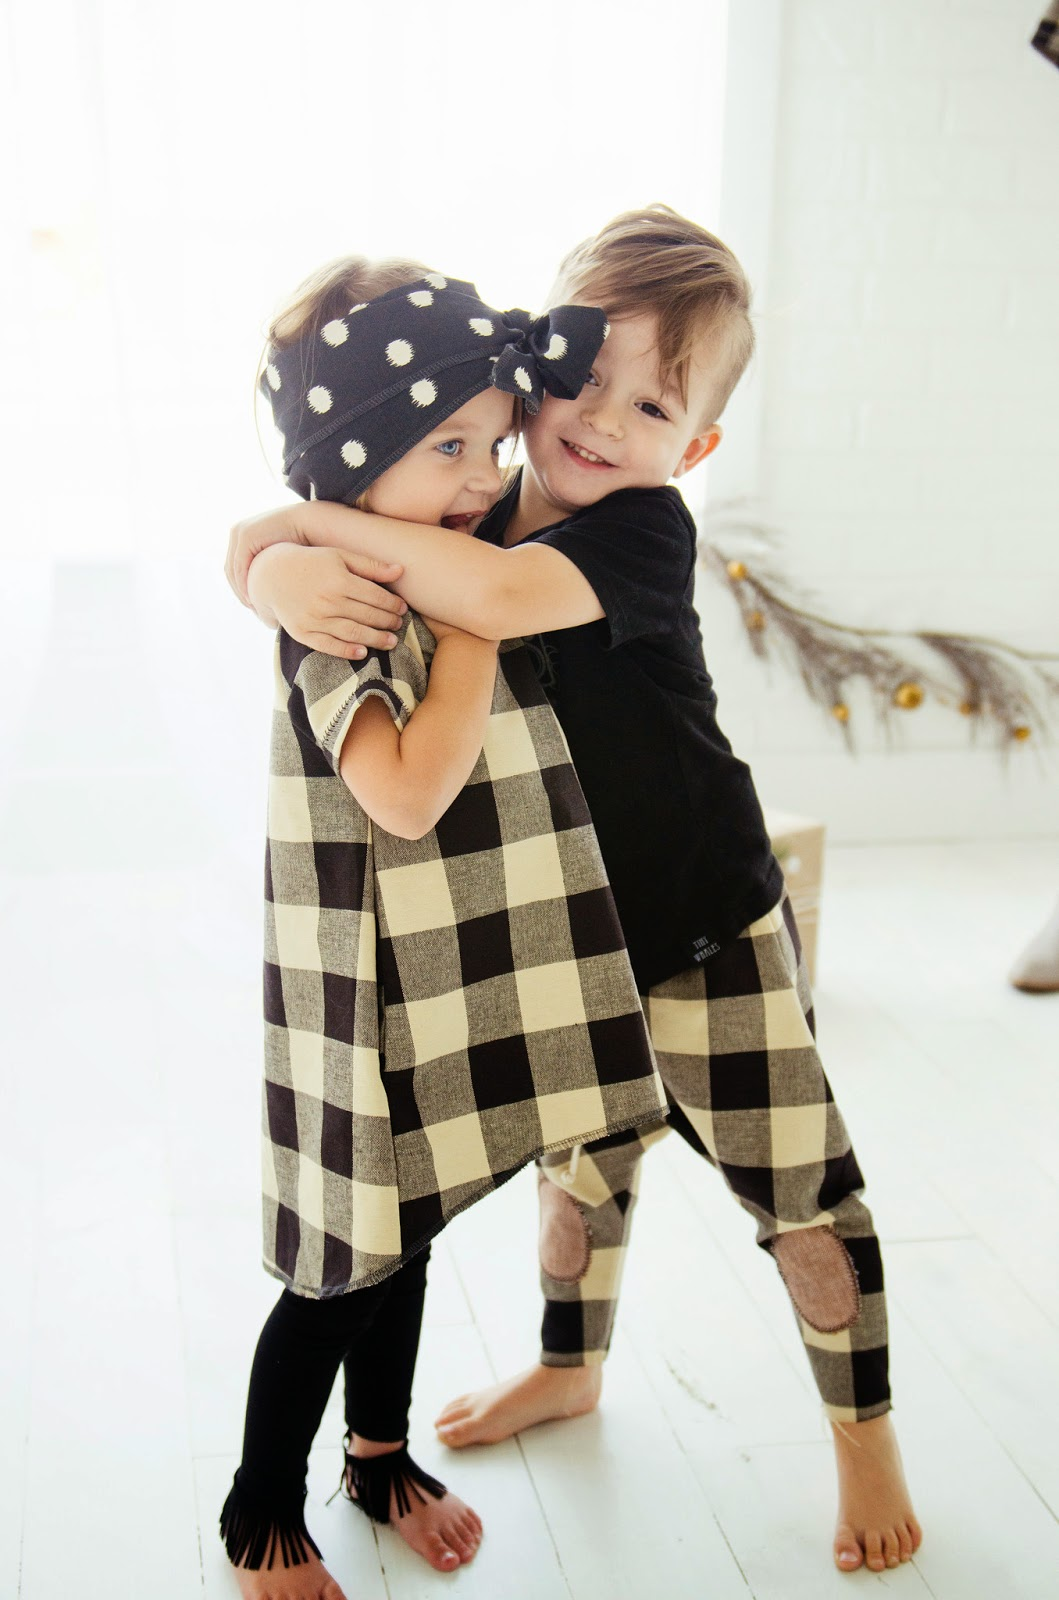 match making boy and girl